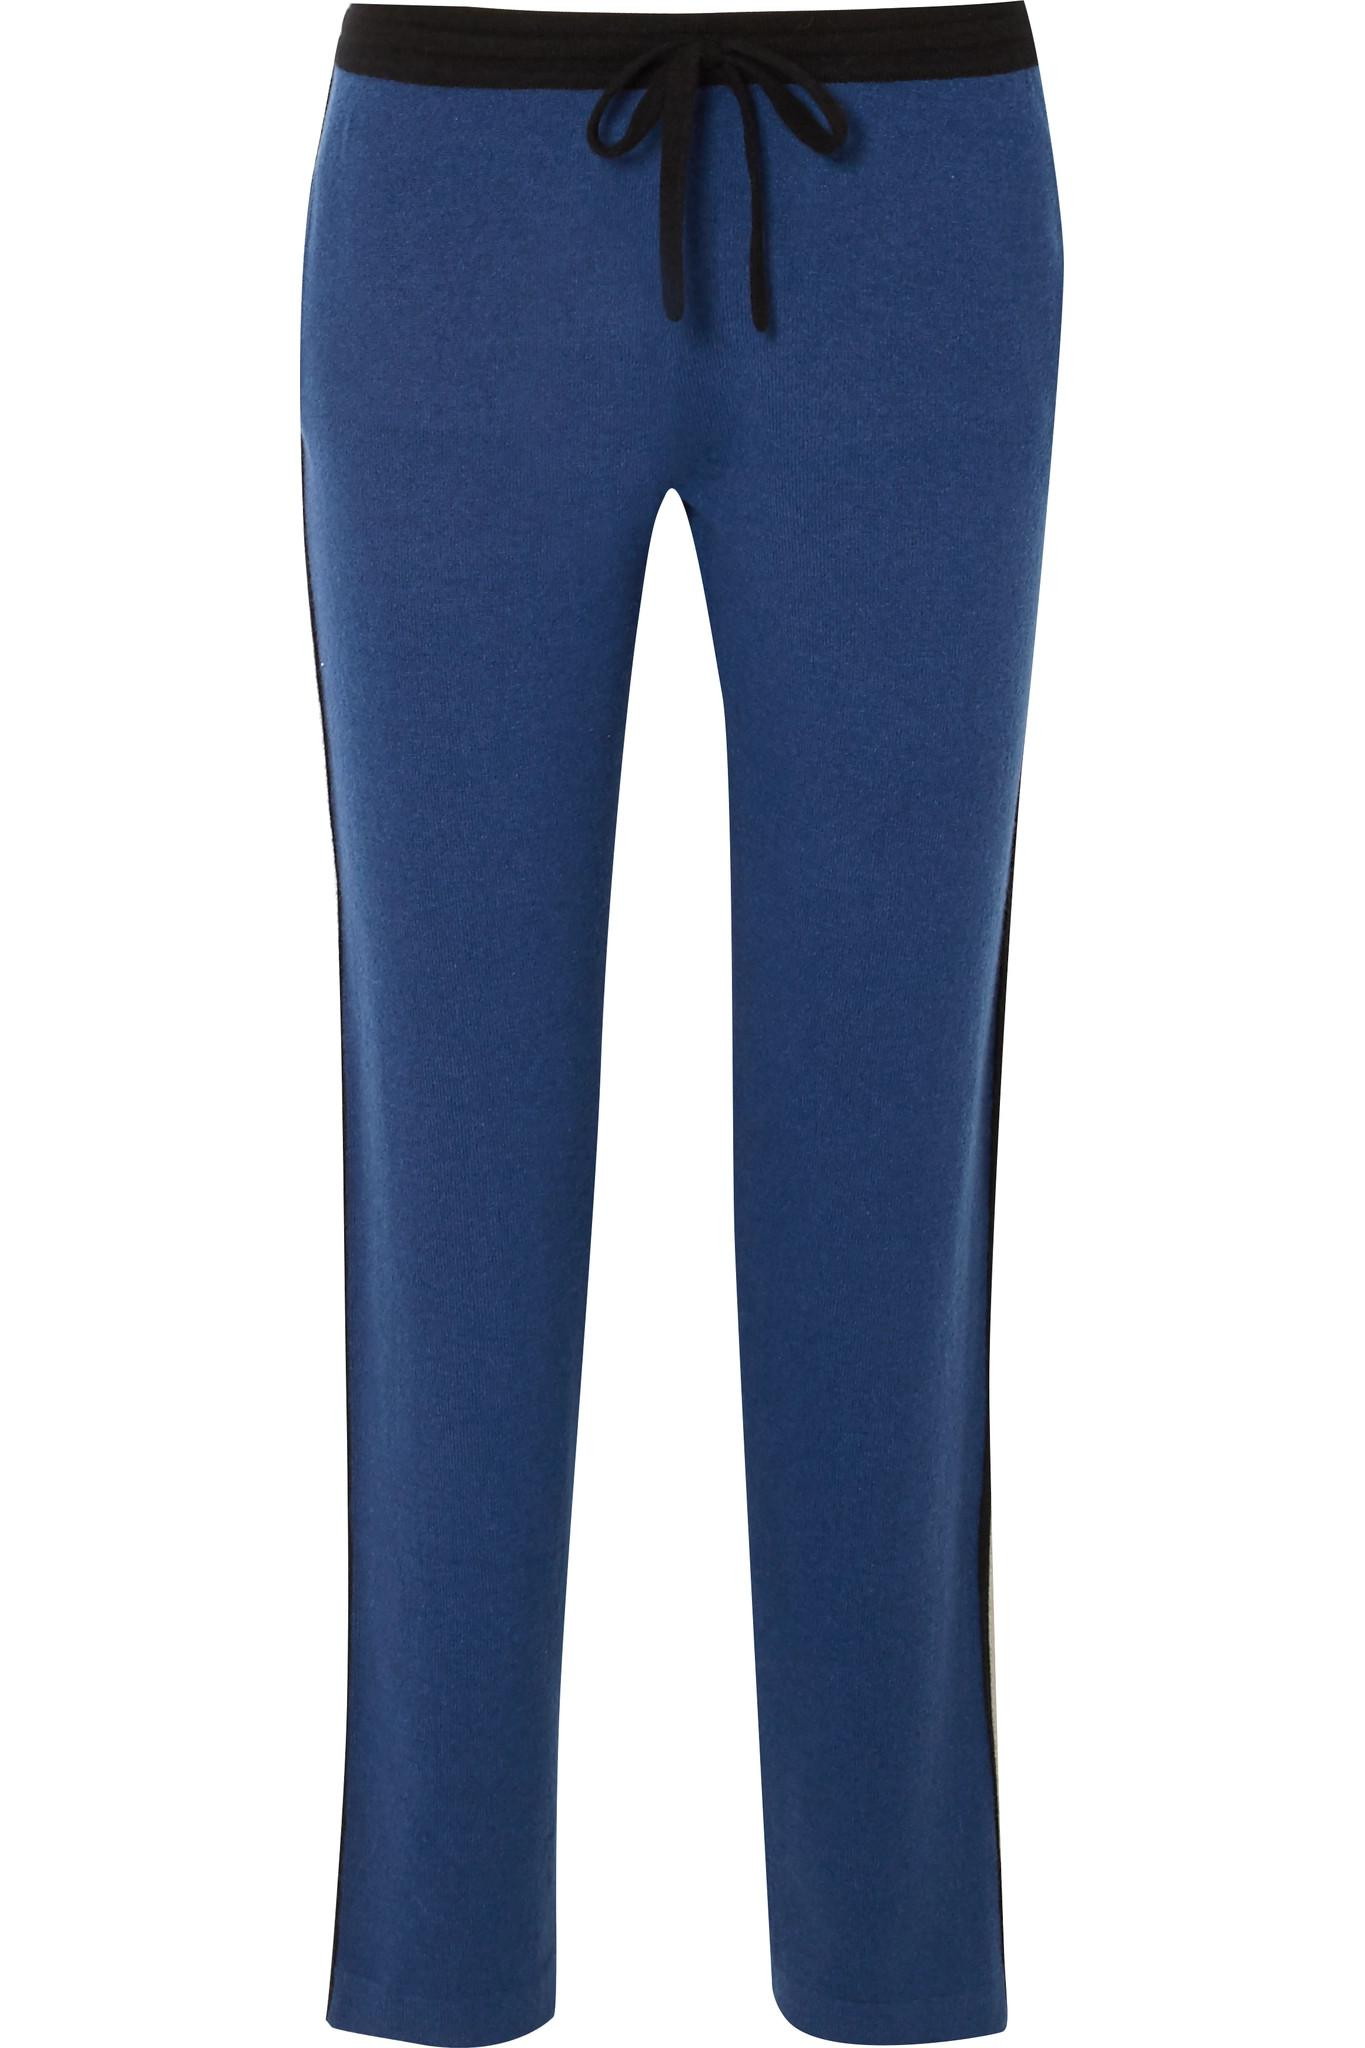 Cashmere Track Pants - Blue Allude Sale Authentic NfcqxWQL